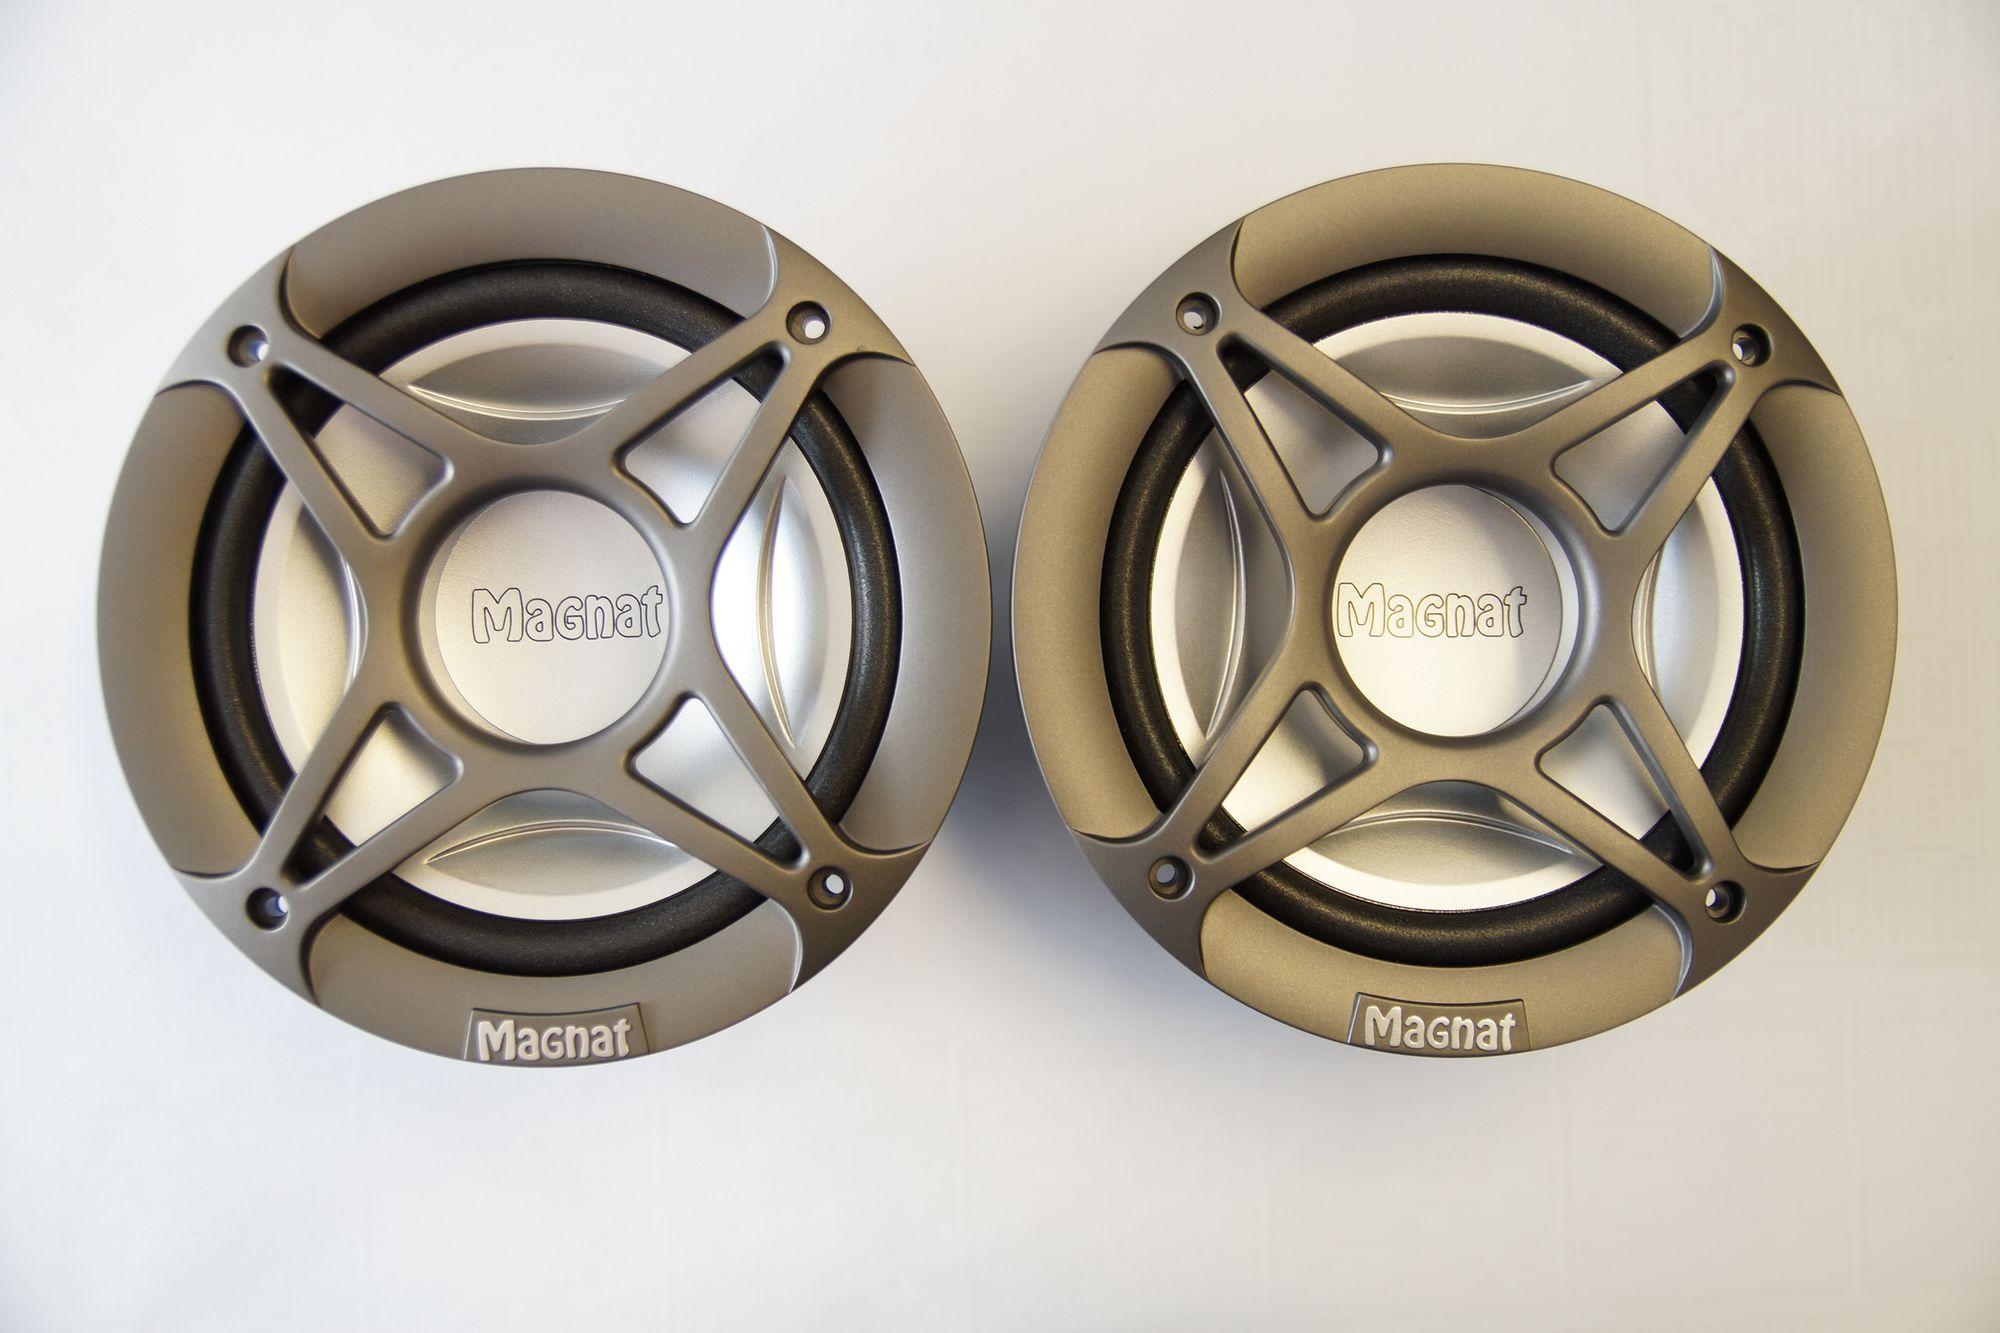 1 Paar Magnat Power Plus 2.16 Subwoofer Kickbass Tieftöner NEU 001